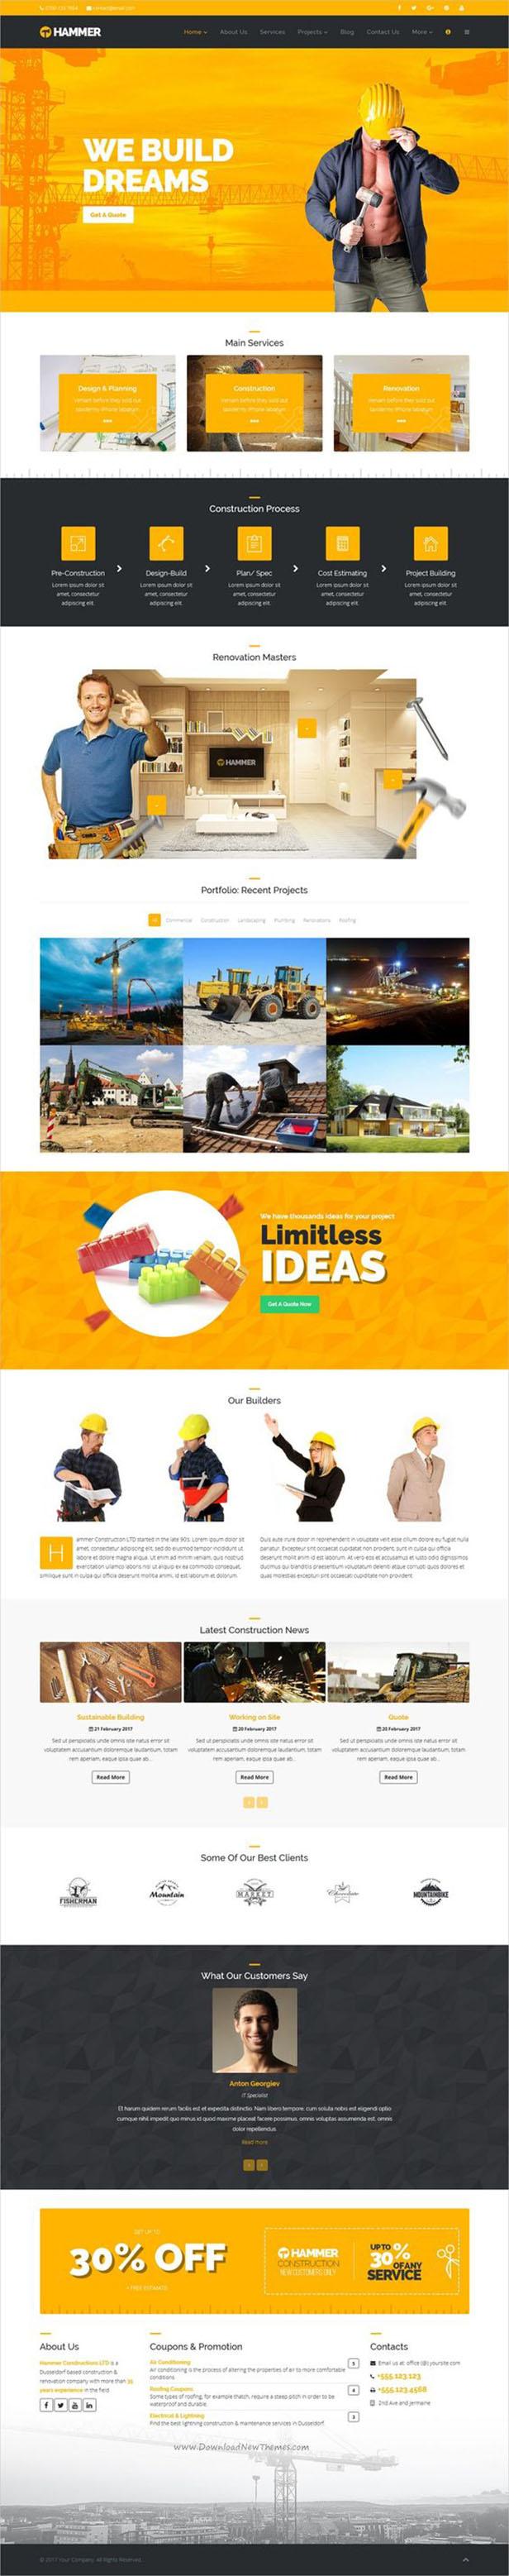 Hammer - Multi-Trade, Construction Business WordPress Theme - 11